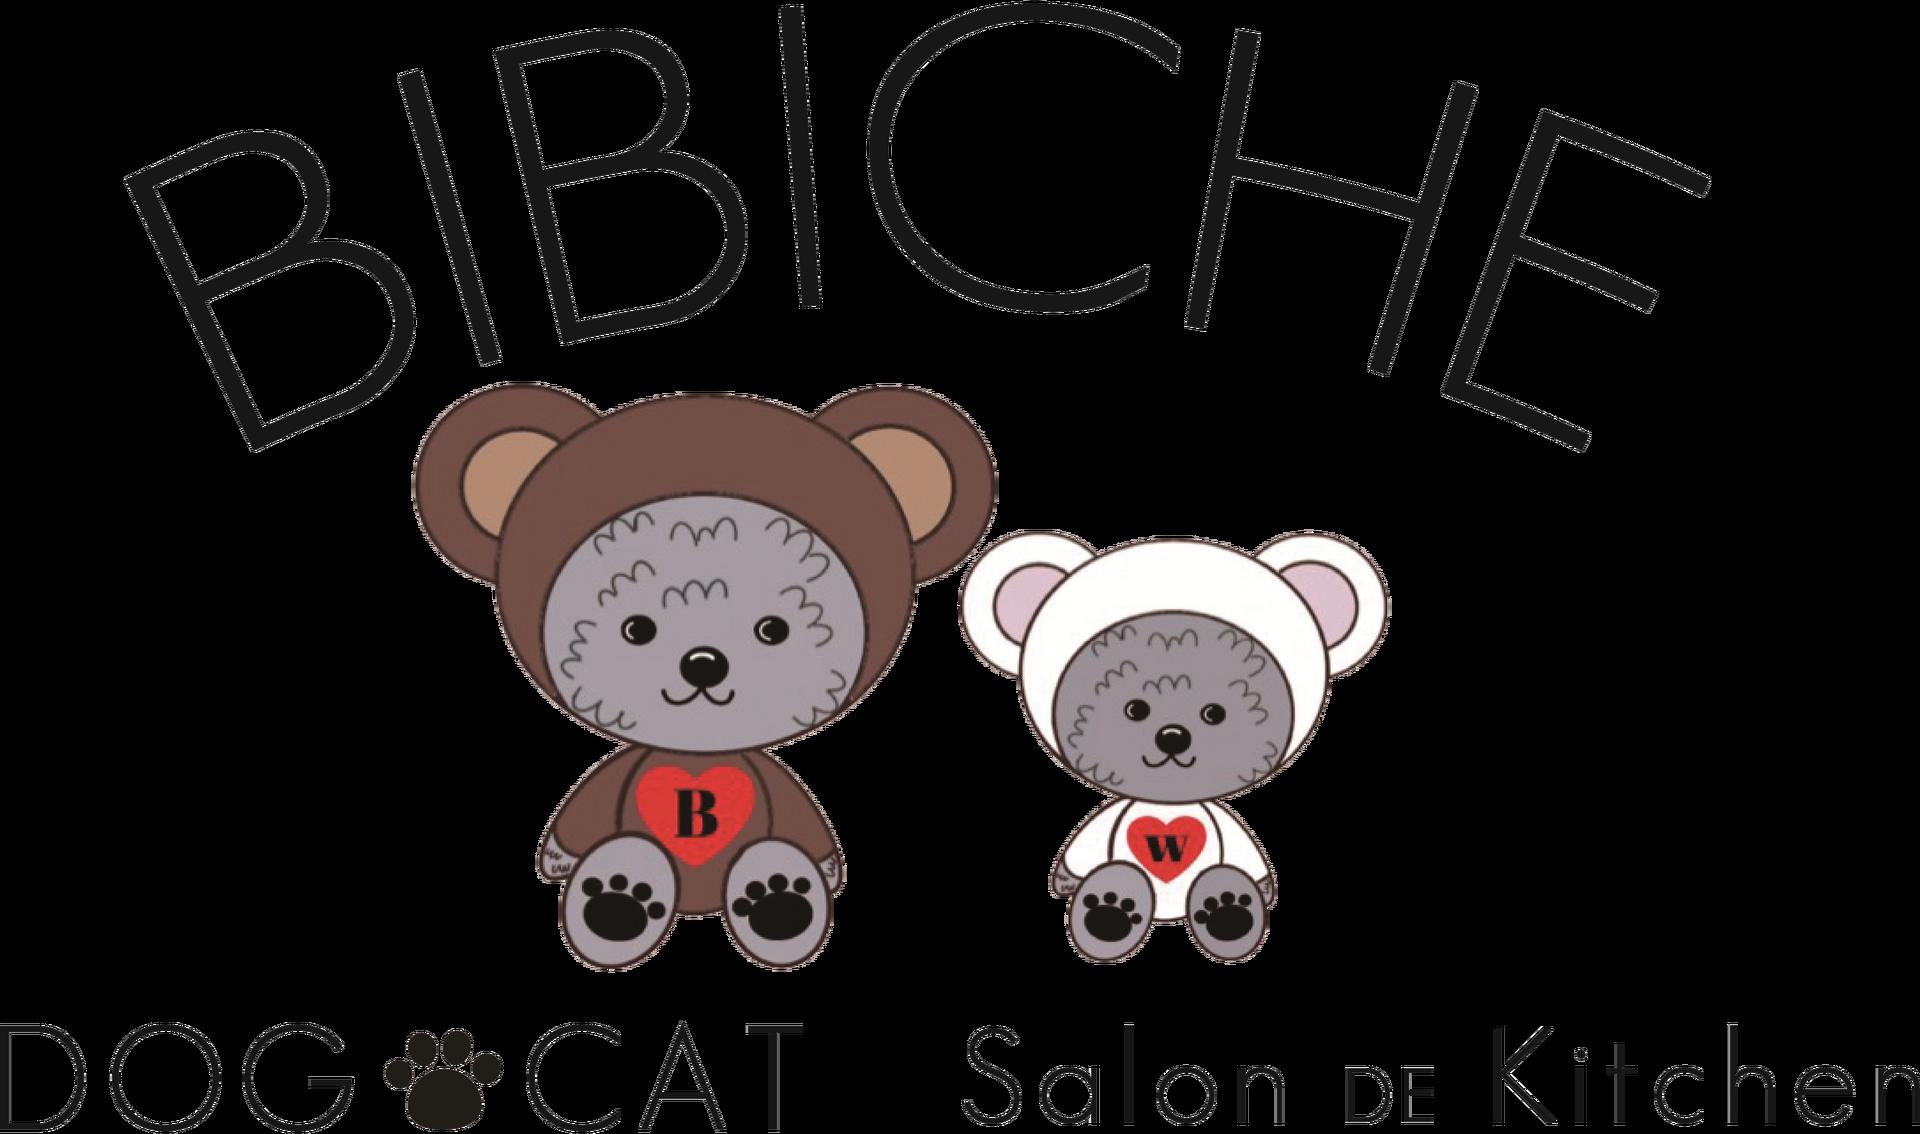 BIBICHE DOG&CAT Salon DE Kitchen